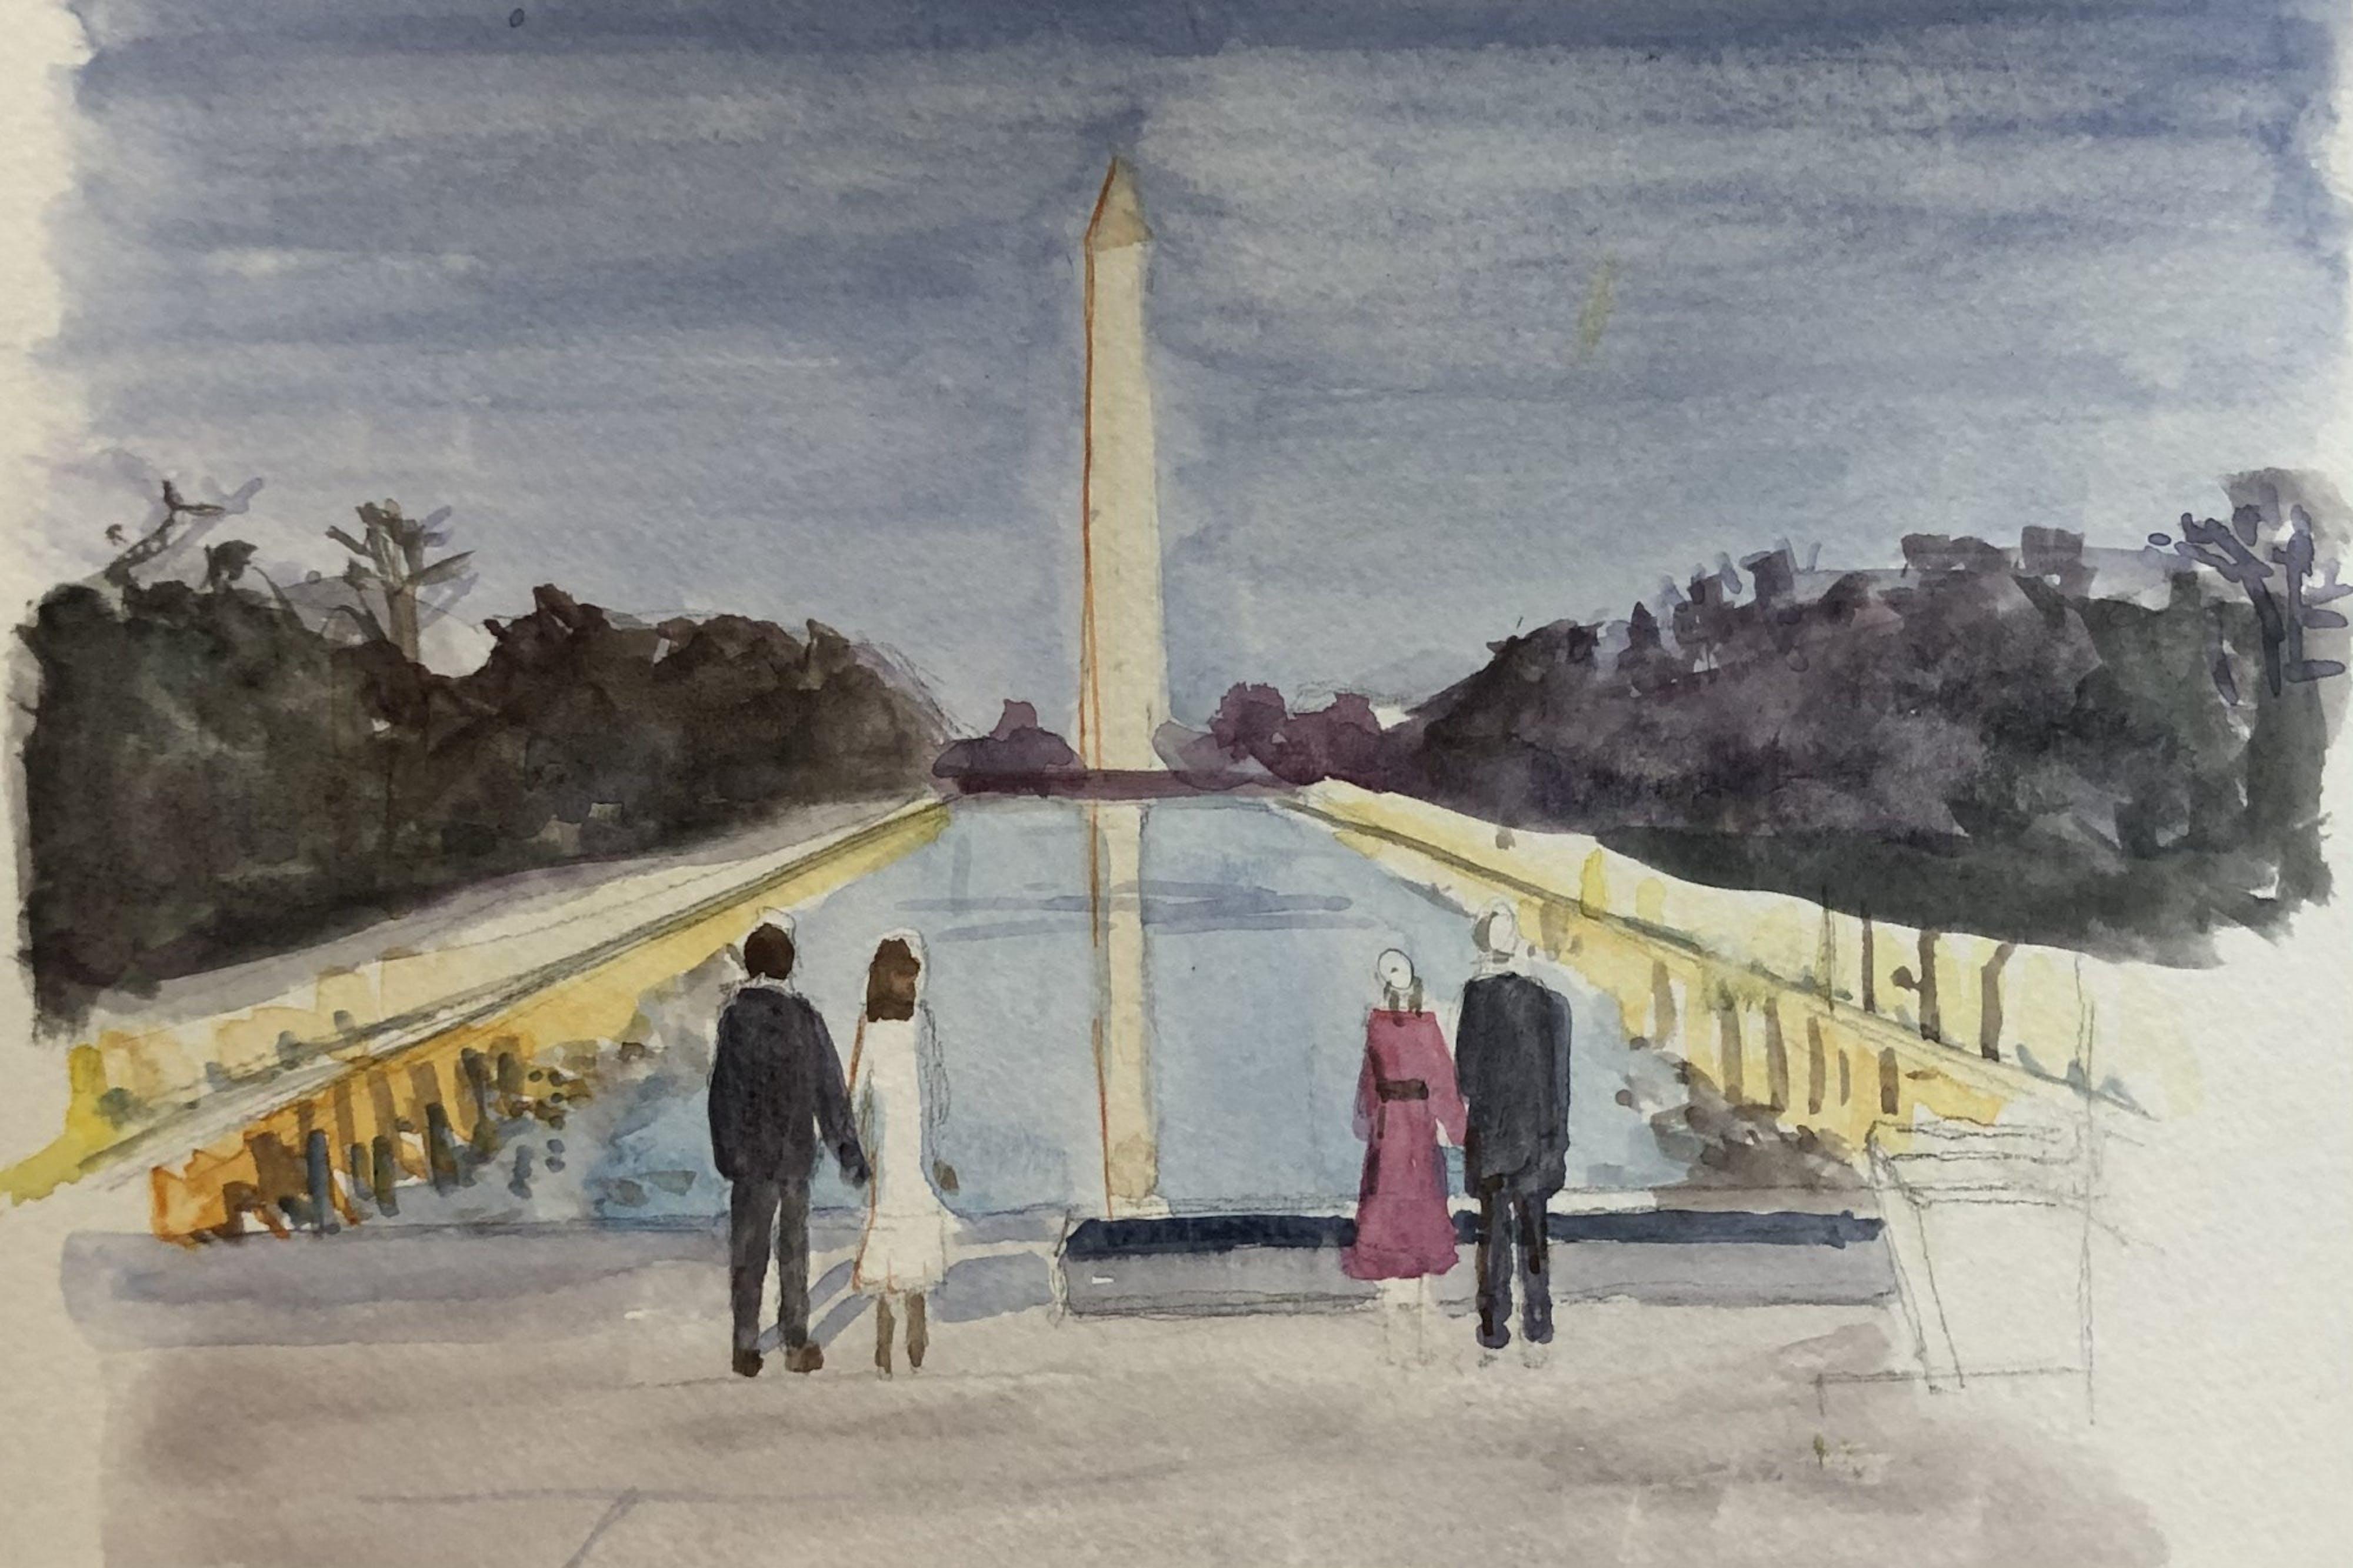 inauguration-watercolor